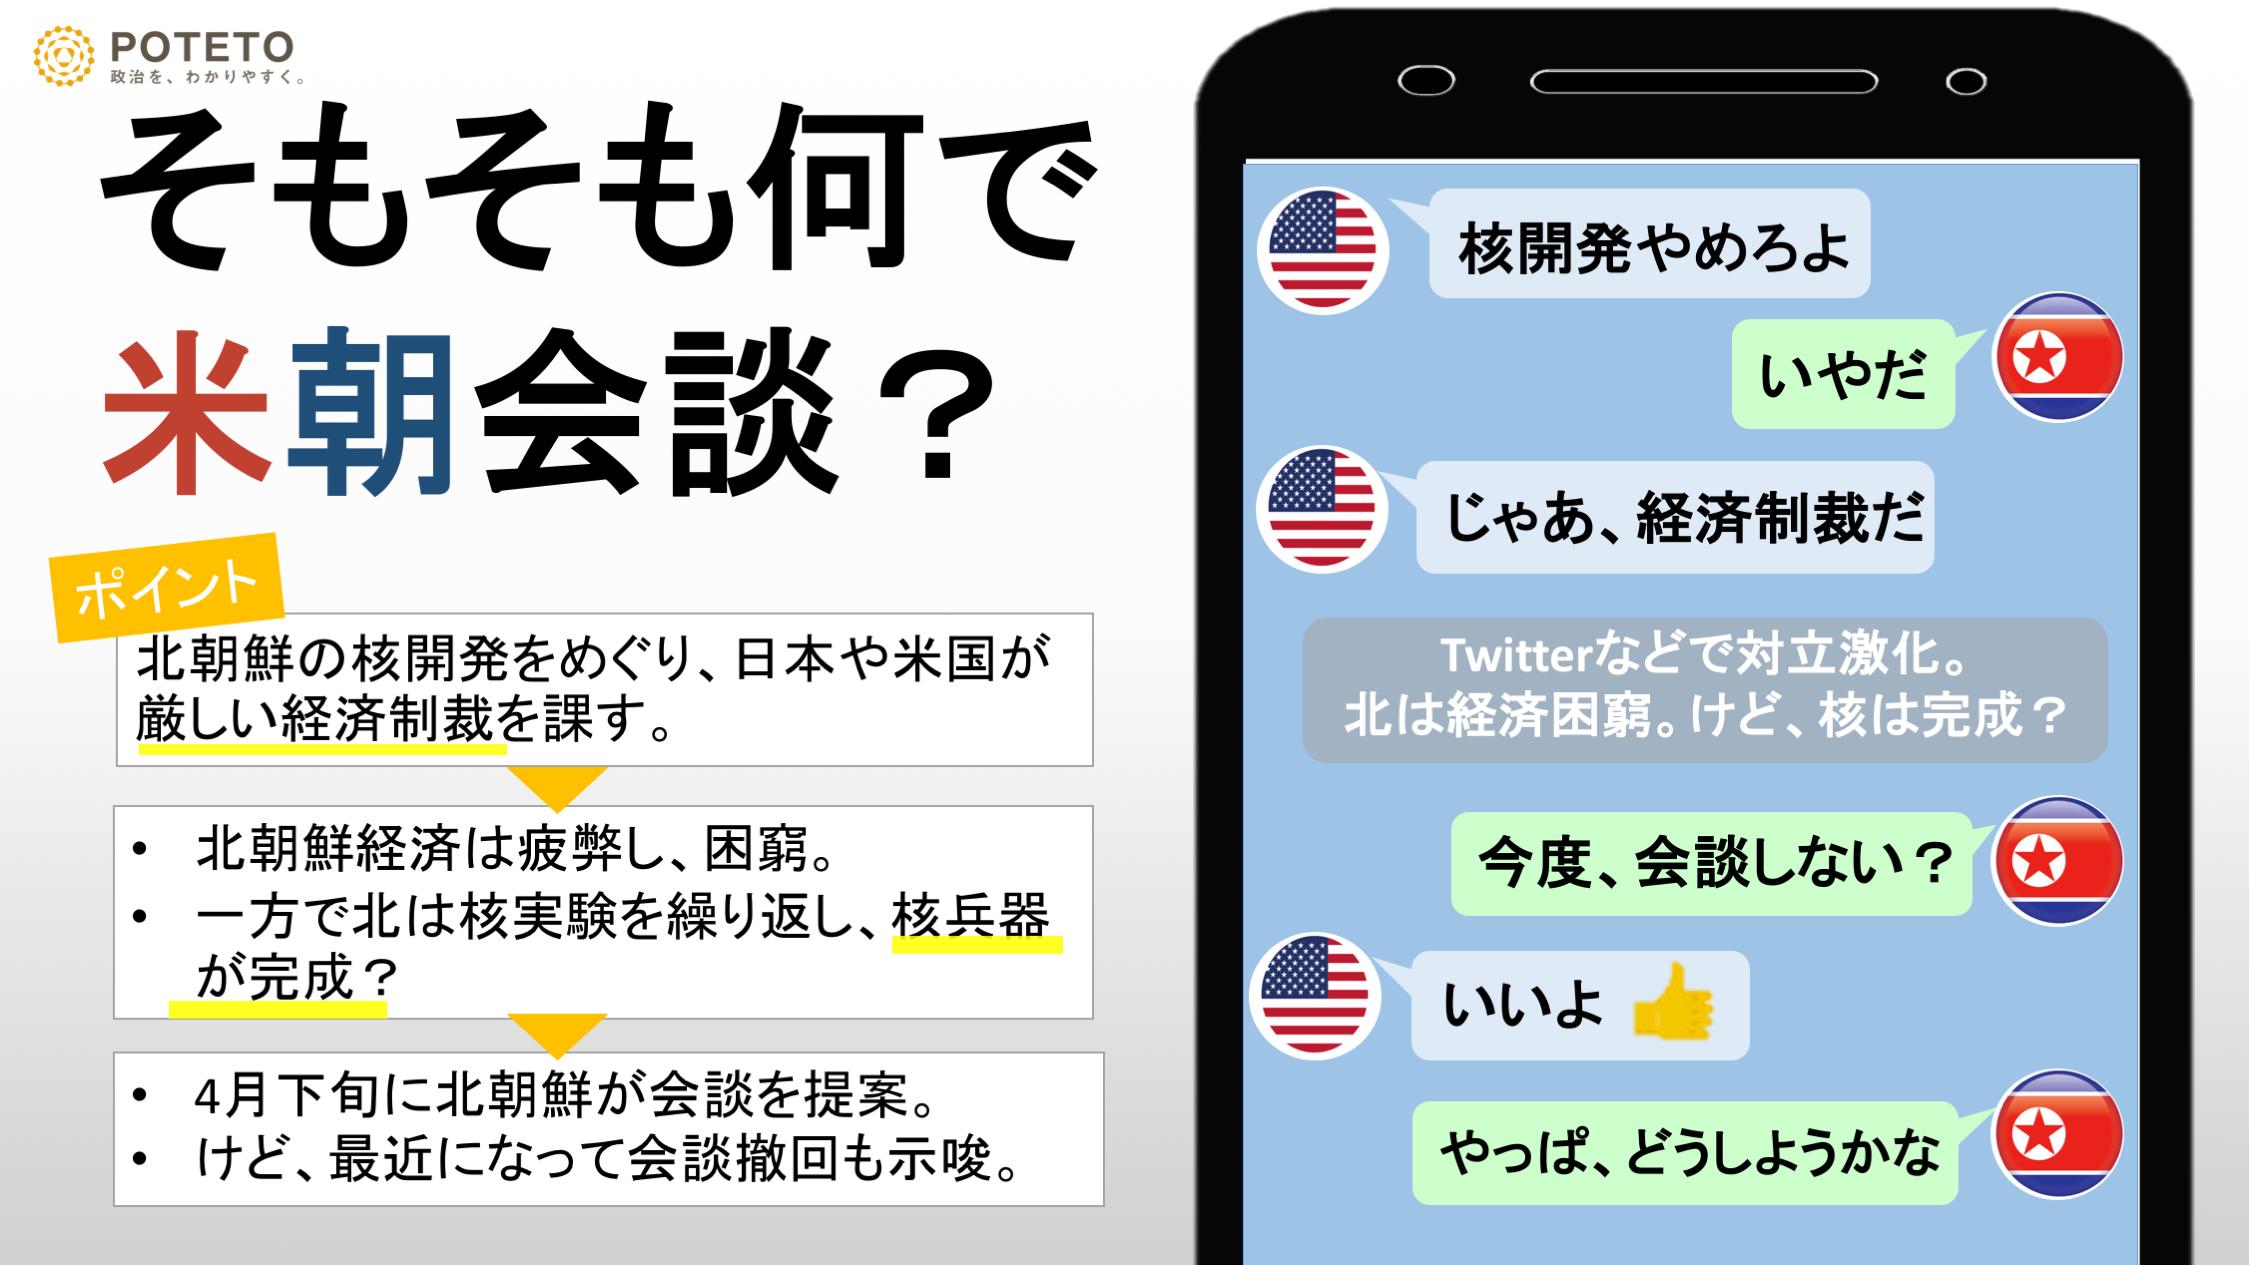 ee3be1d100caf1aa771552d59c2bd436 1 - 米国民の8割が米朝会談に賛成?<br>海外の反応、日本への影響は?